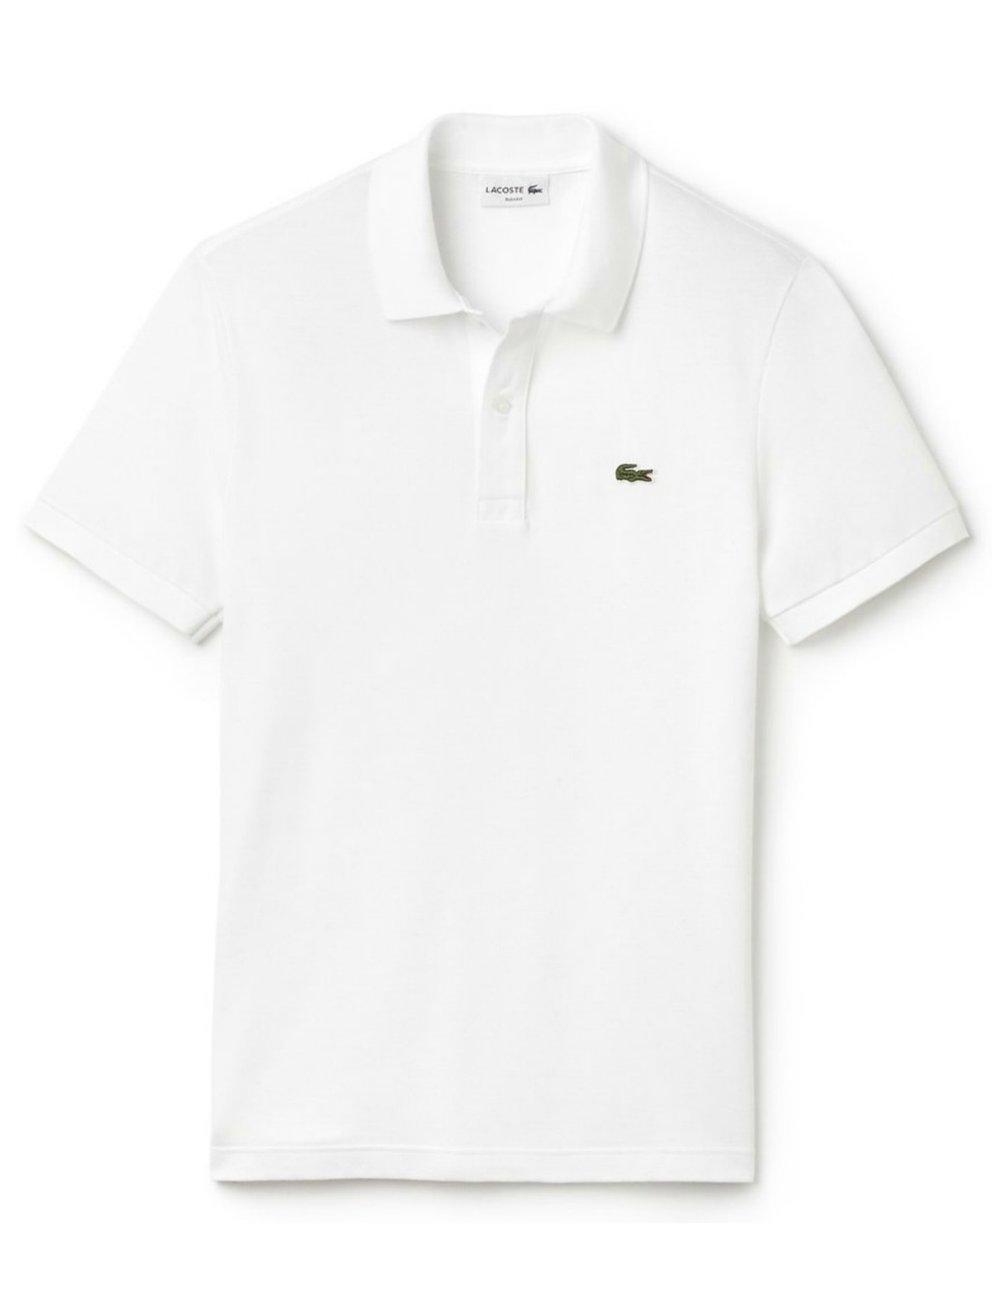 LACOSTEBasic slim fit polo shirt - LACOSTE.COM